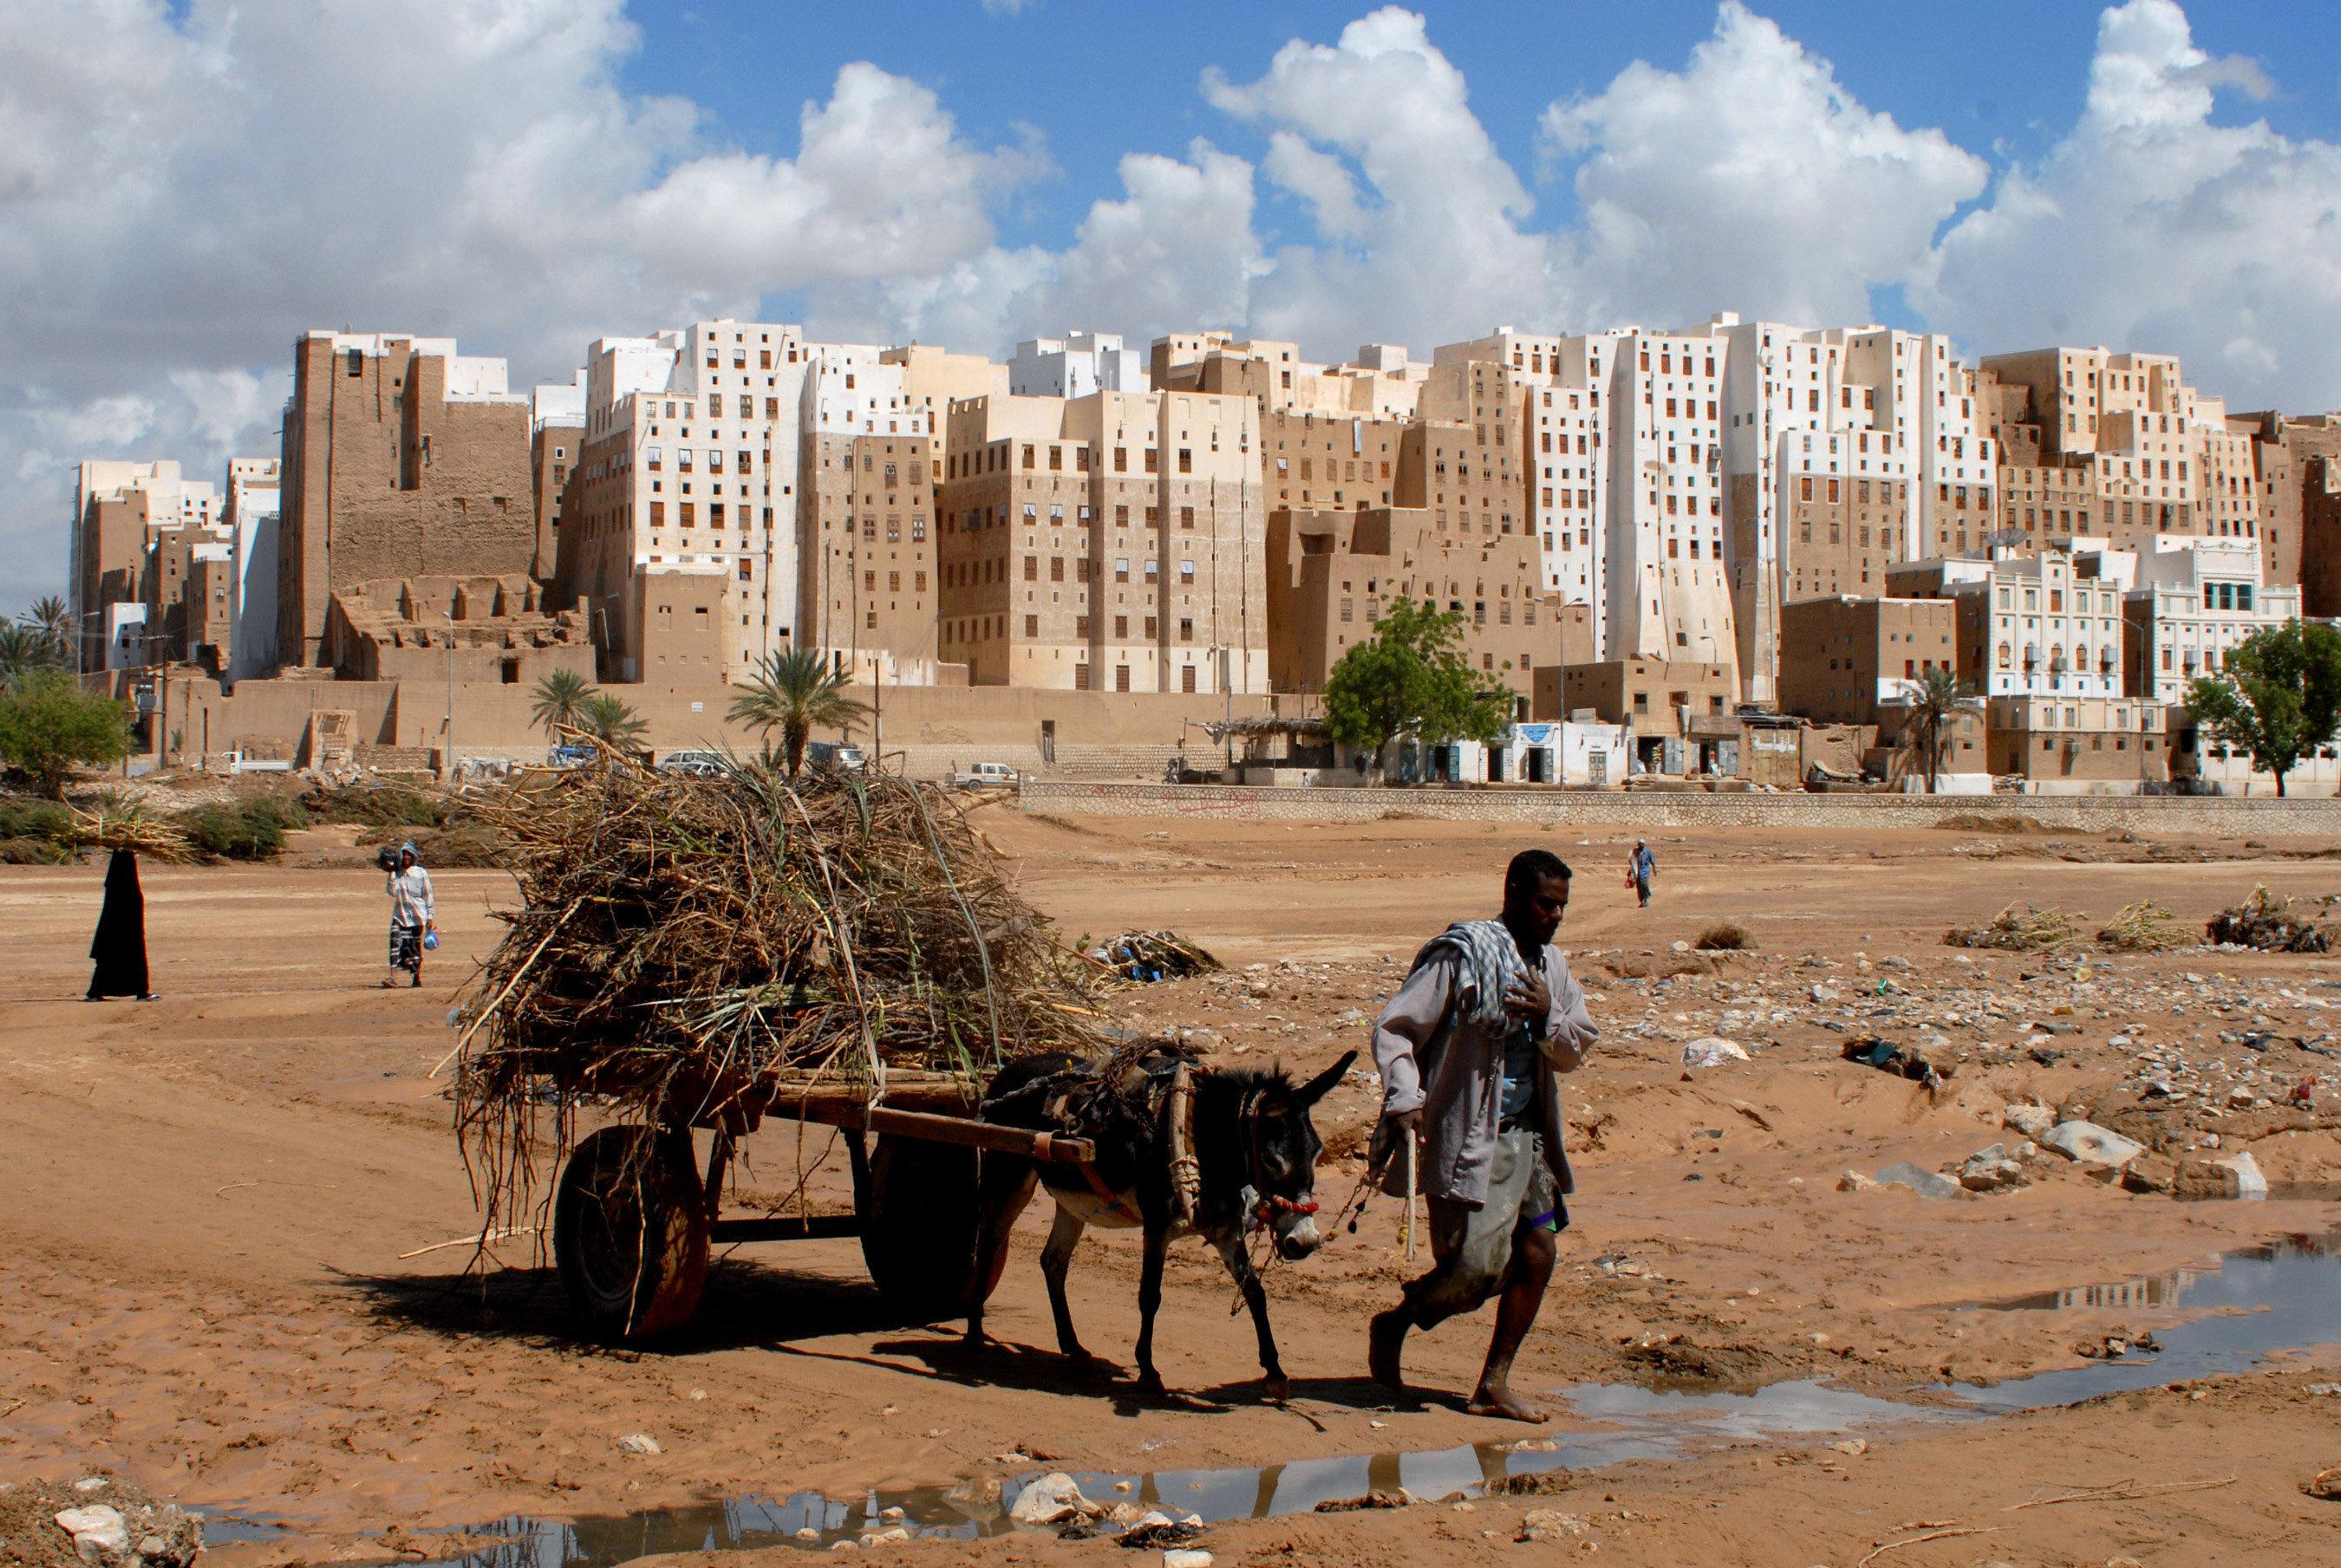 A Yemeni man pulls his donkey cart past the historical city of Shibam in Hadramaut province of eastern Yemen on October 28, 2008